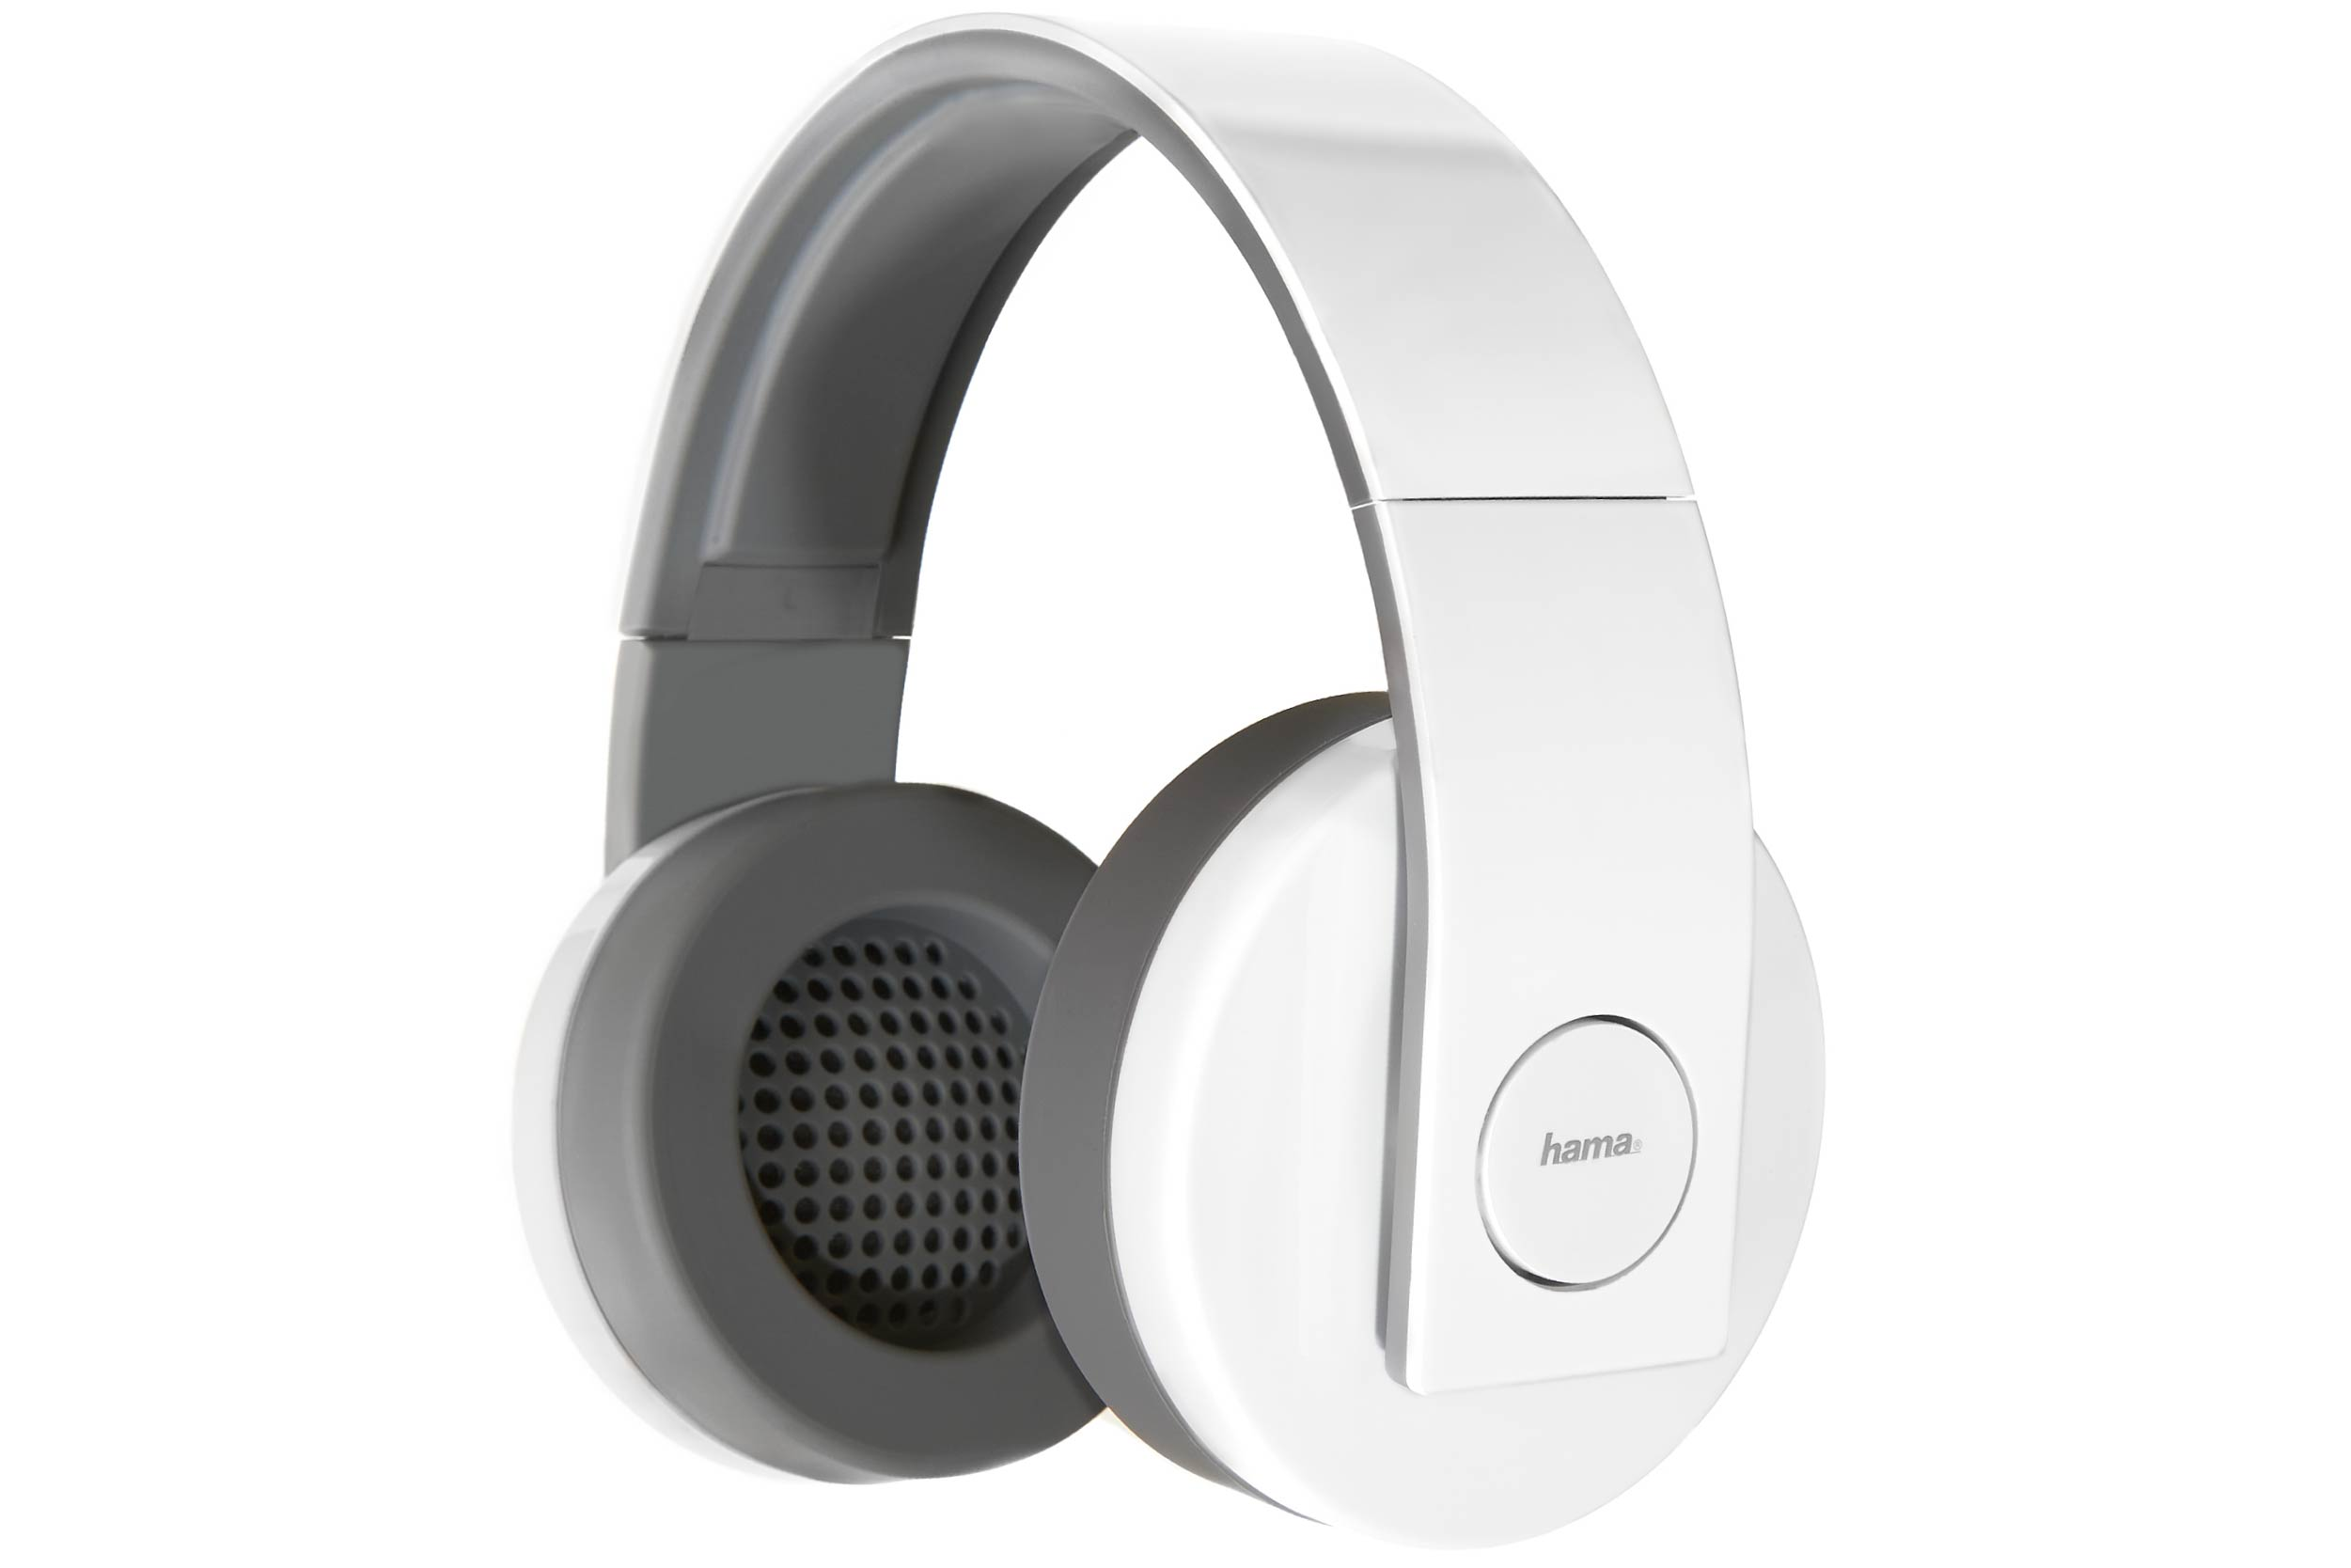 HAMA-OVER-EAR-4